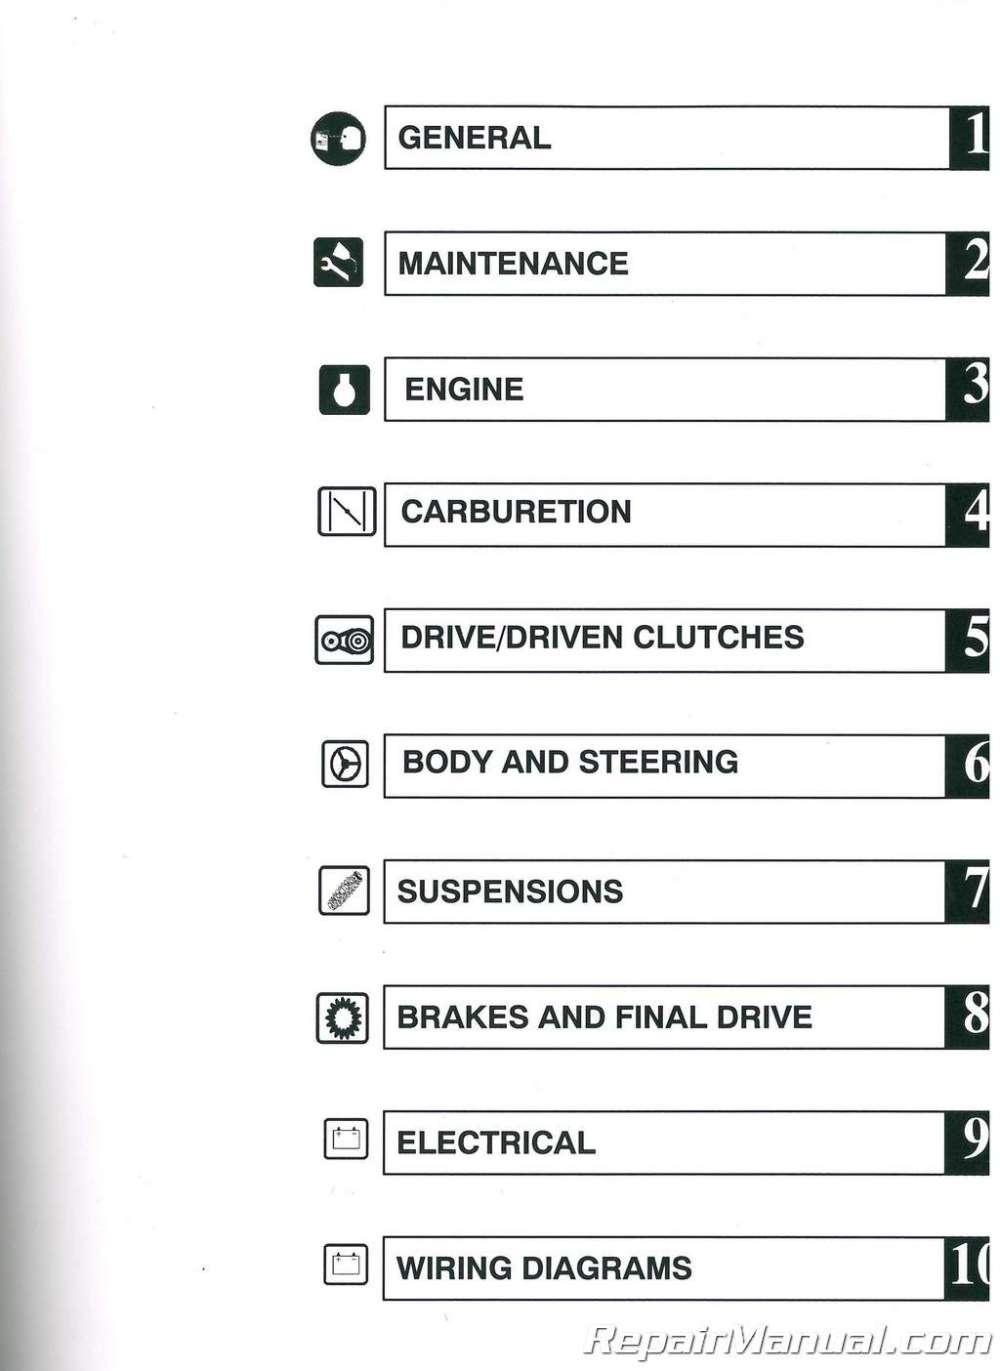 medium resolution of 2002 polaris xc sp and xcr performance snowmobile service manual 2002 polaris xcsp 600 wiring diagram